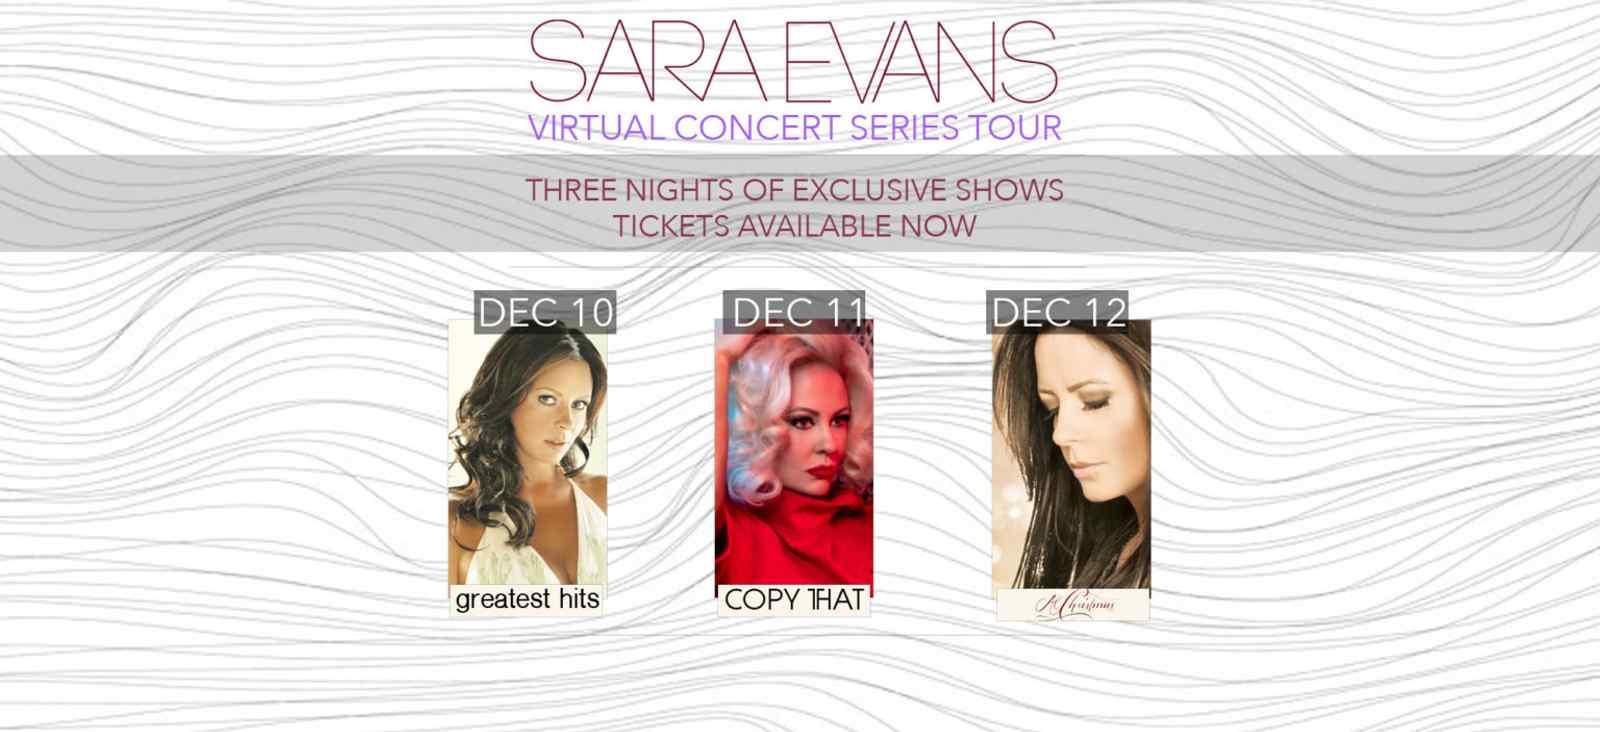 Sara Evan's Virtual Concert Series Tour: Copy THAT Livestream